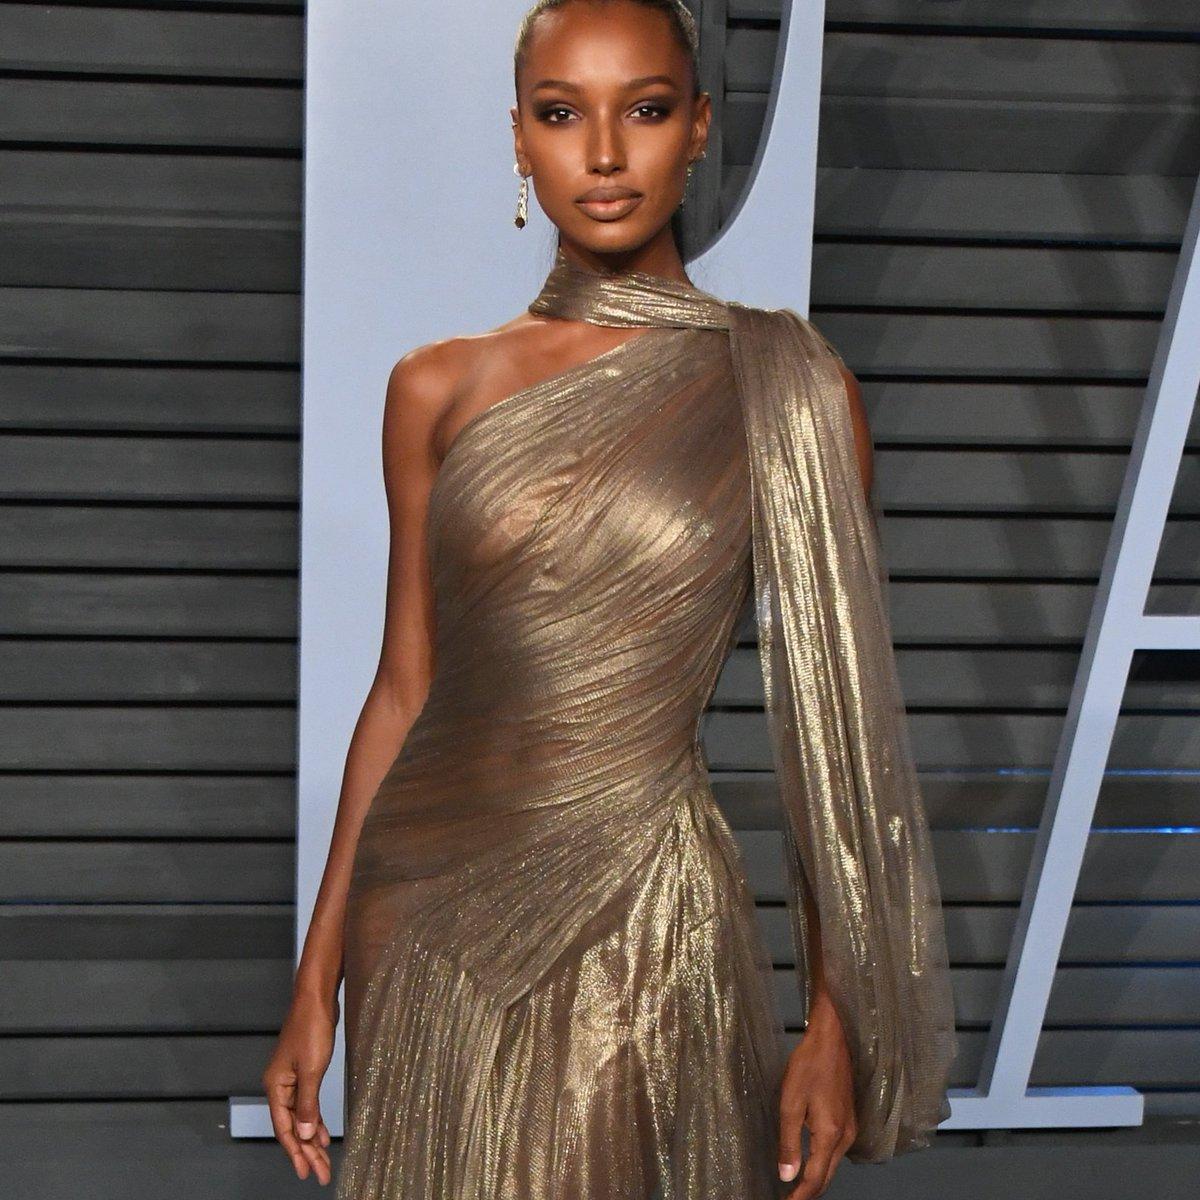 Nice Celeb And Girls On Twitter Jasmine Tookes See Through Dress At 2018 Vanity Fair Oscar Party Jasminetookes Seethrough Vanityfairoscarparty Https T Co Xwxscndvtk Https T Co Twckco2dp3